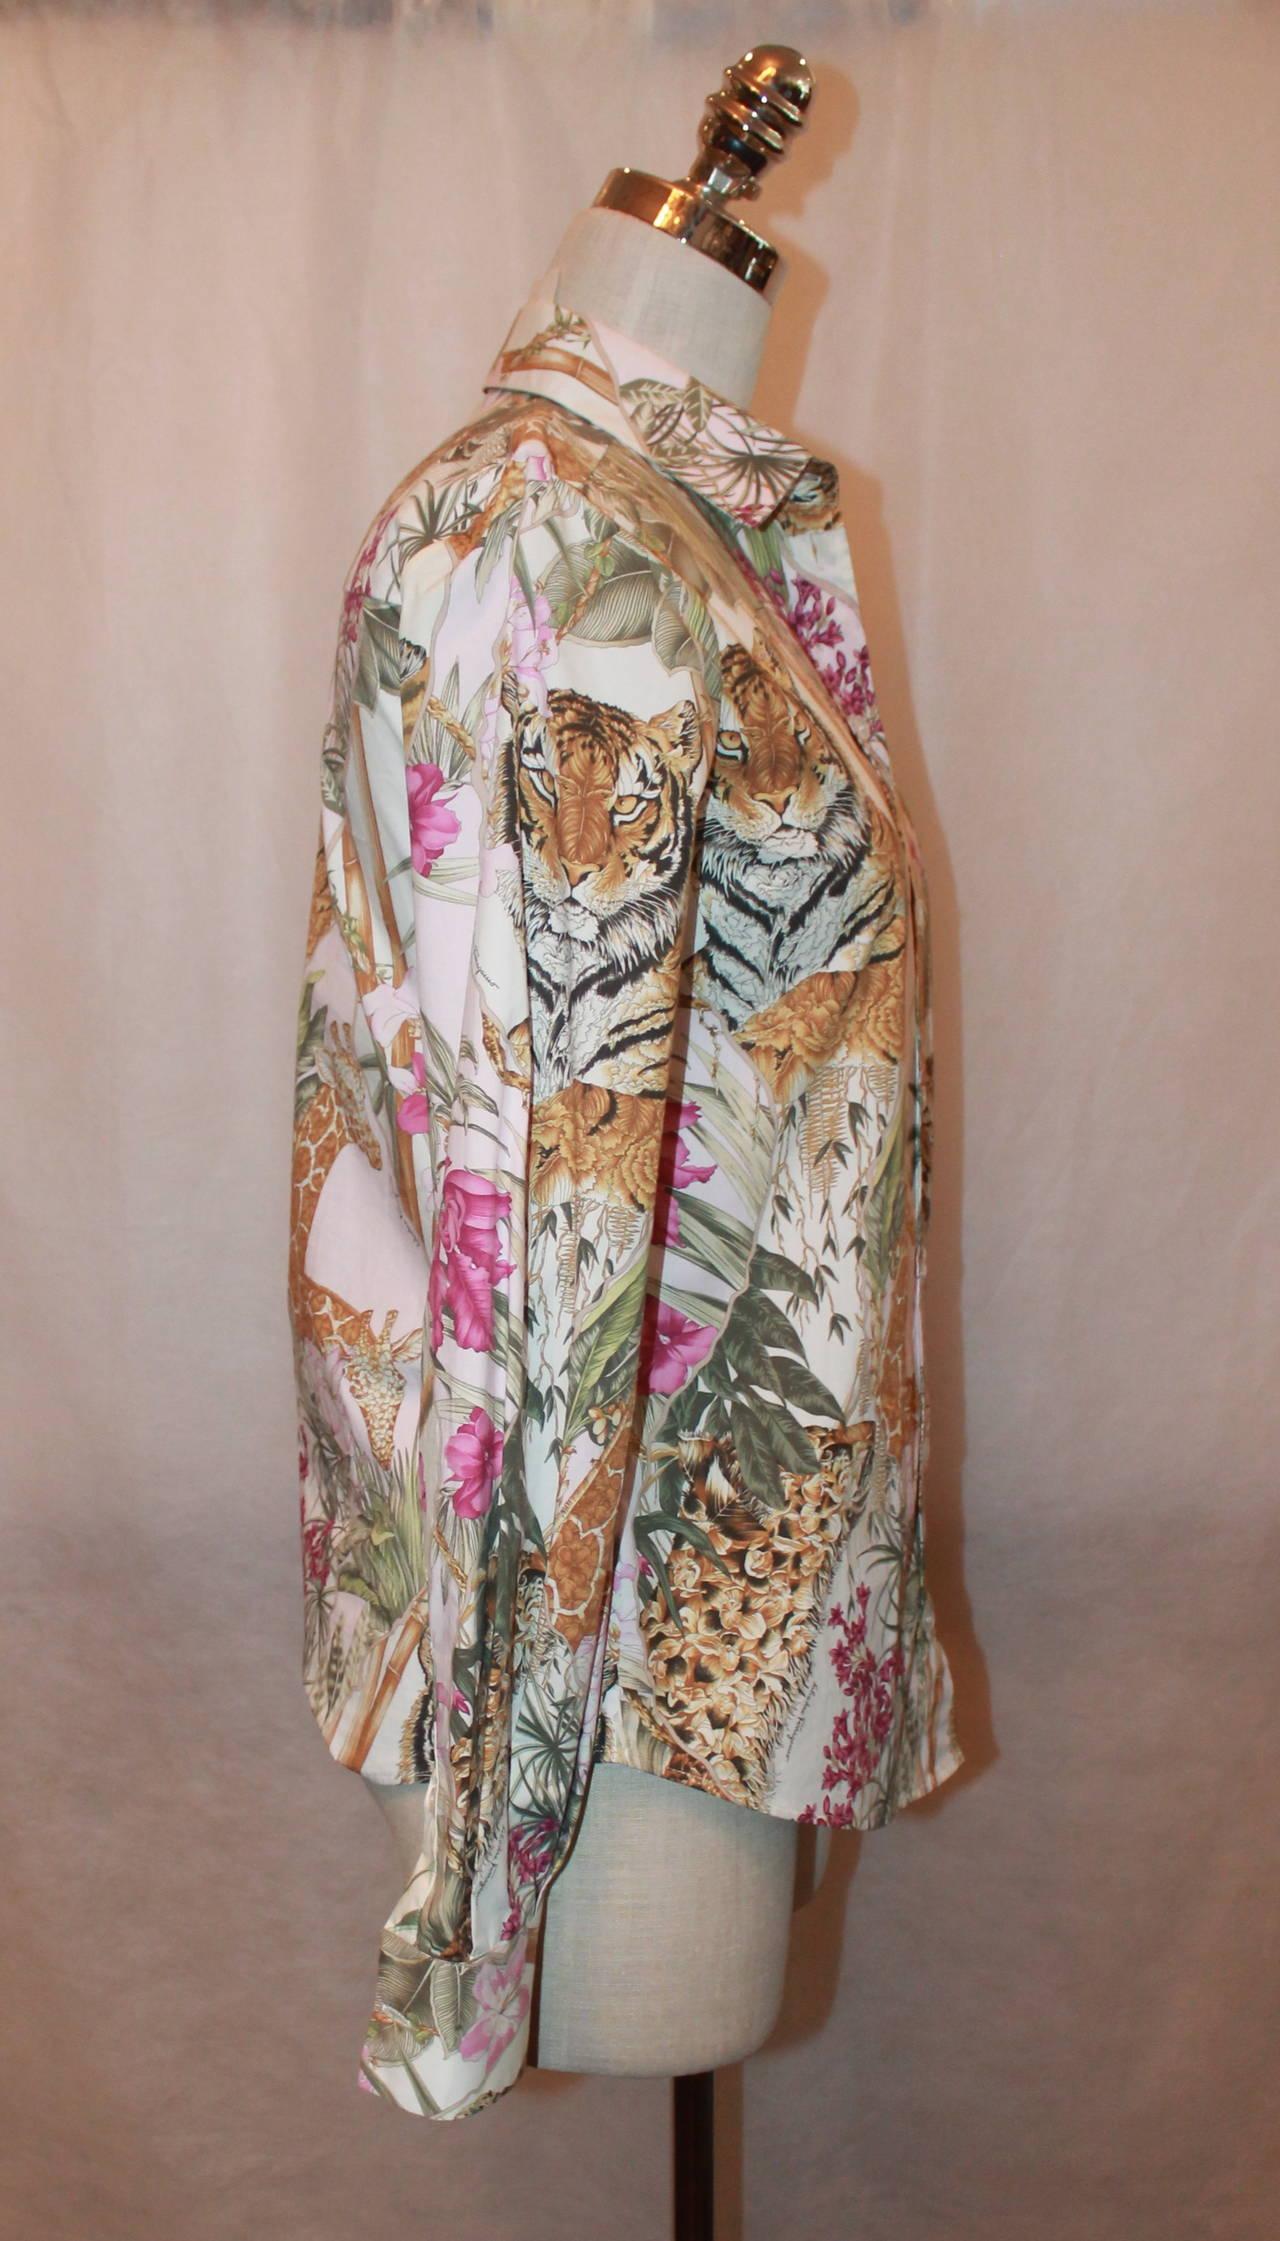 Salvatore Ferragamo Multi Color Jungle Print Long Sleeve Shirt - 40 3